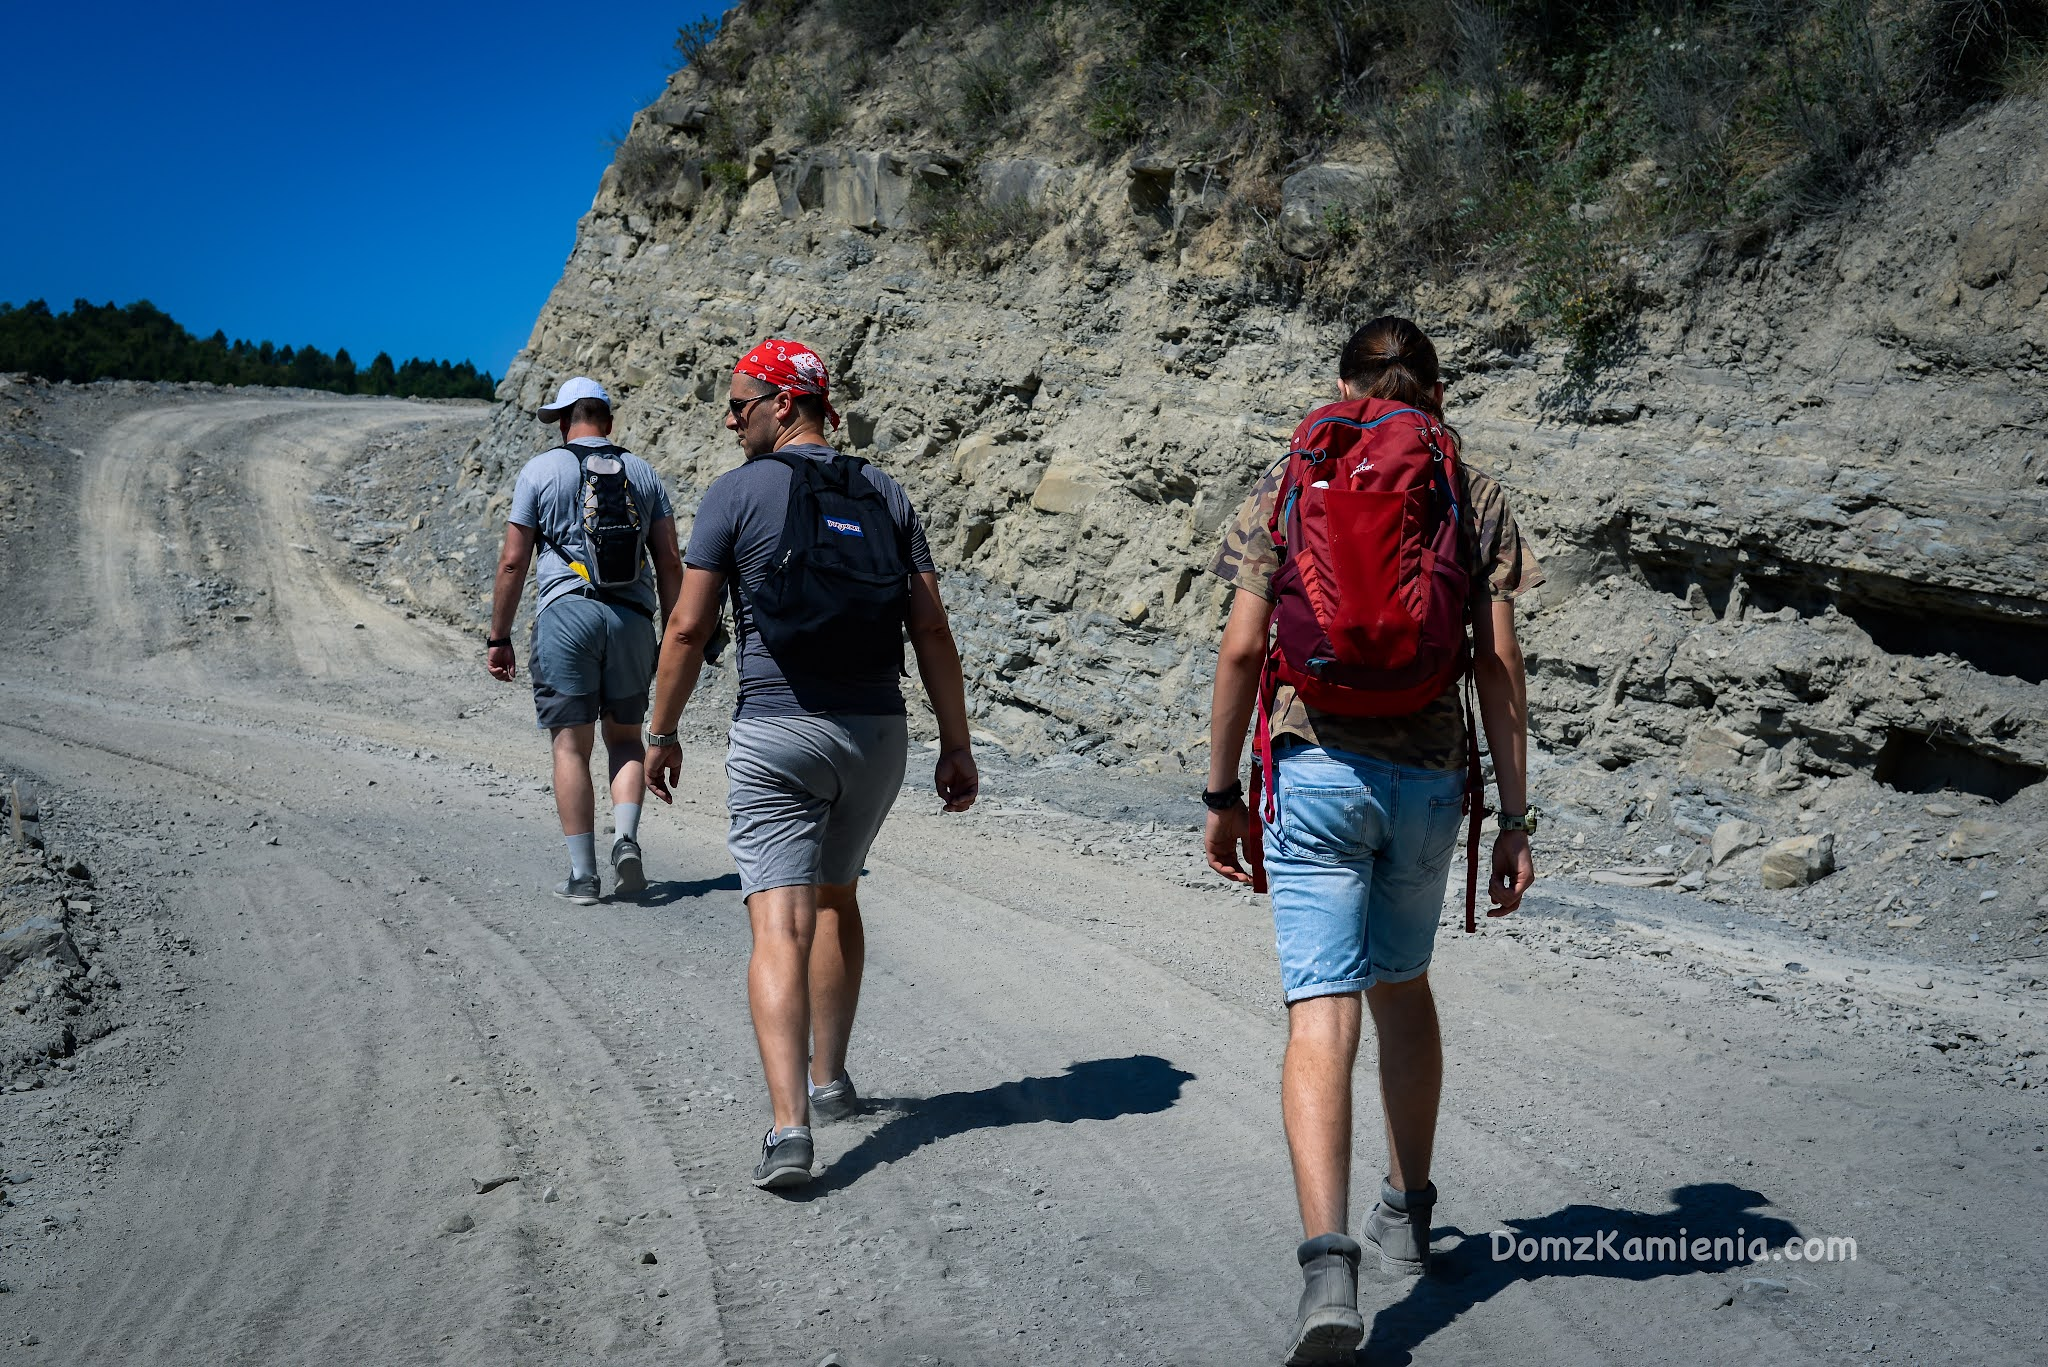 Trekking Marradi Dom z Kamienia blog